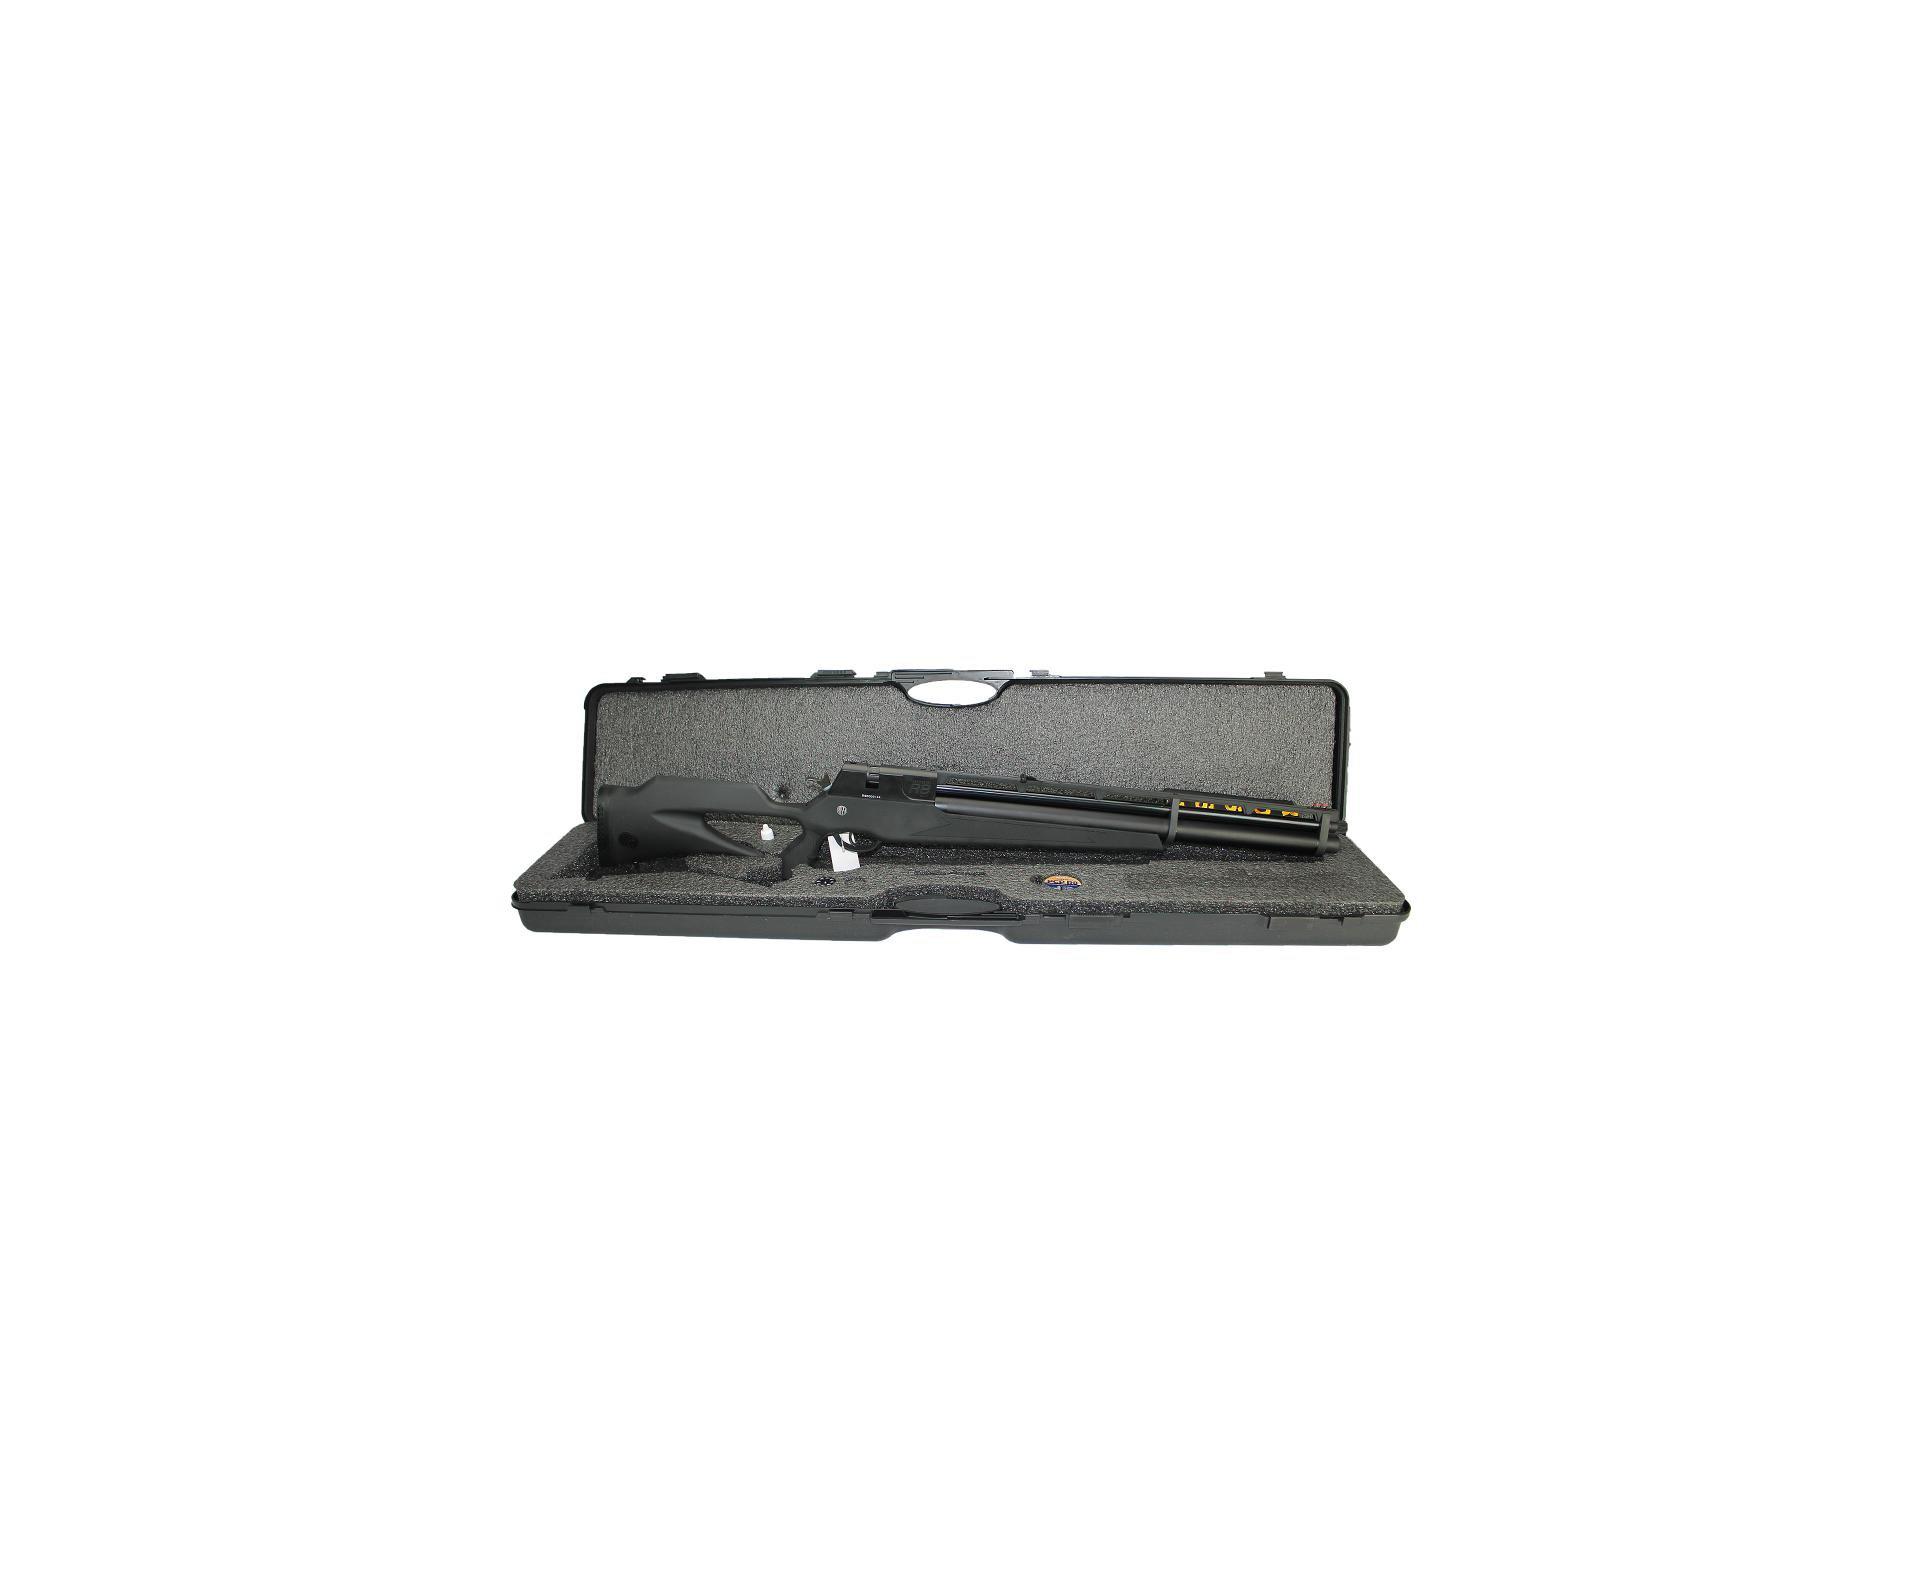 Carabina De Pressão Pcp Rossi R8 Black 5,5mm 8 Tiros 350 M/s + Bomba Pneumatica